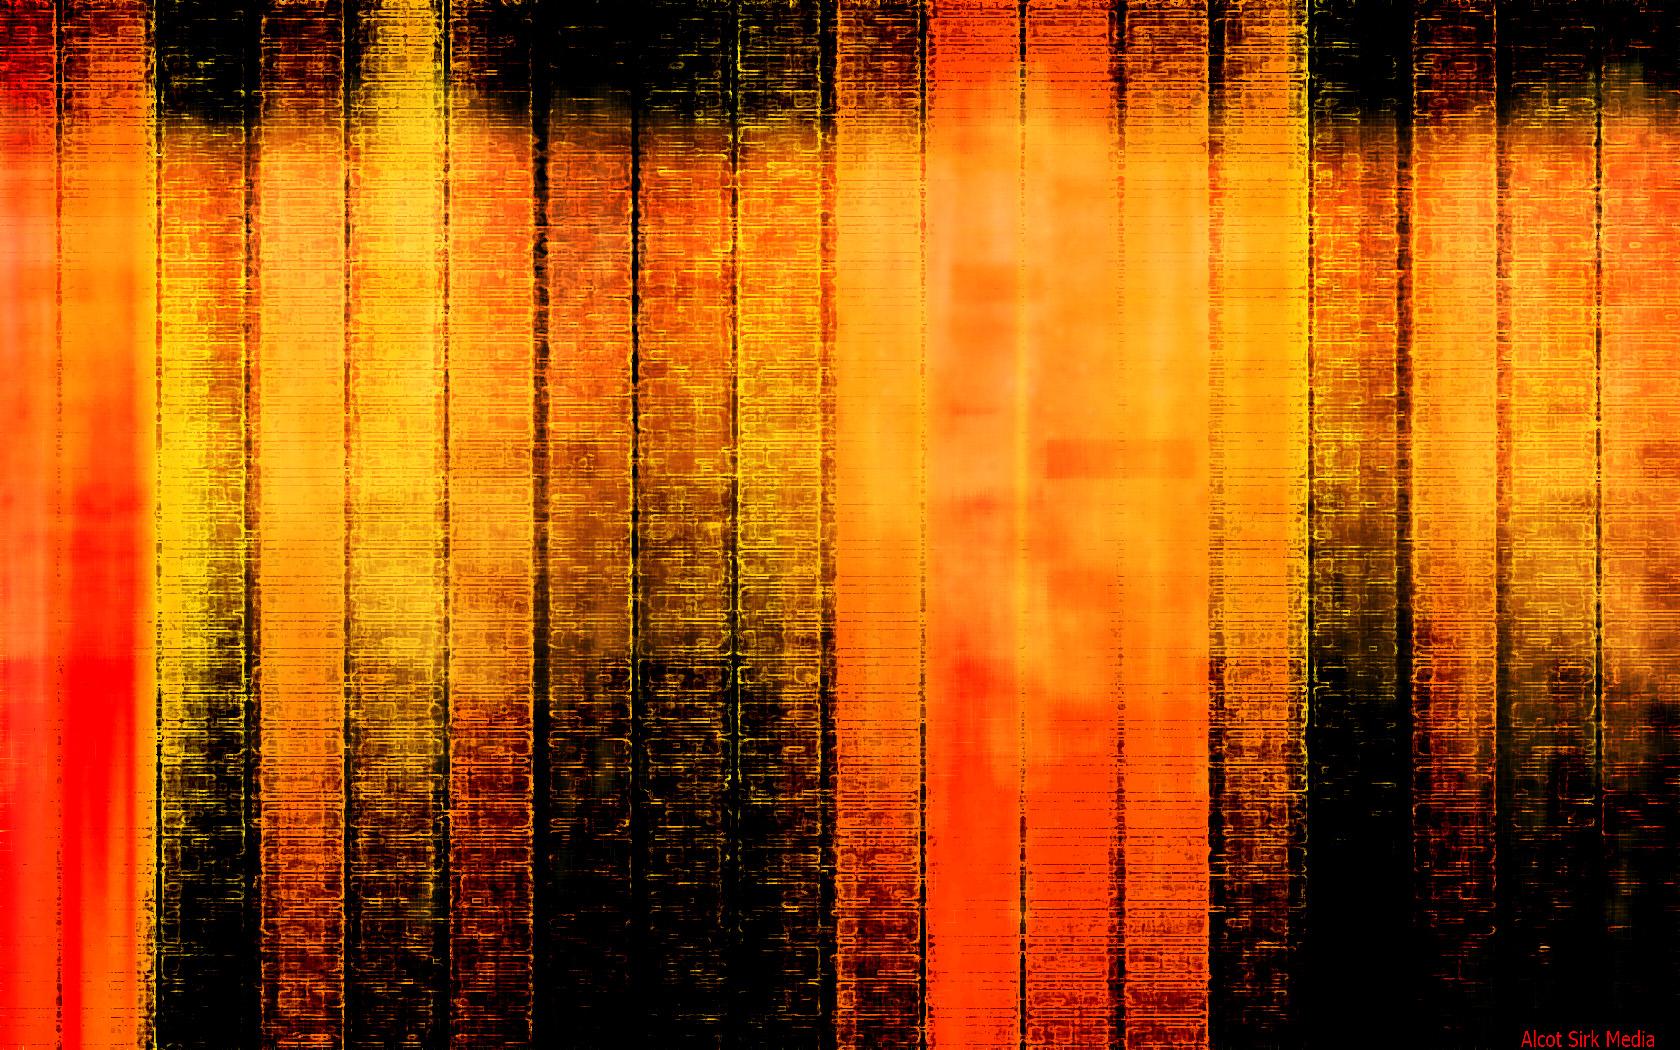 Abstract orange wallpaper wallpapersafari for Orange wallpaper